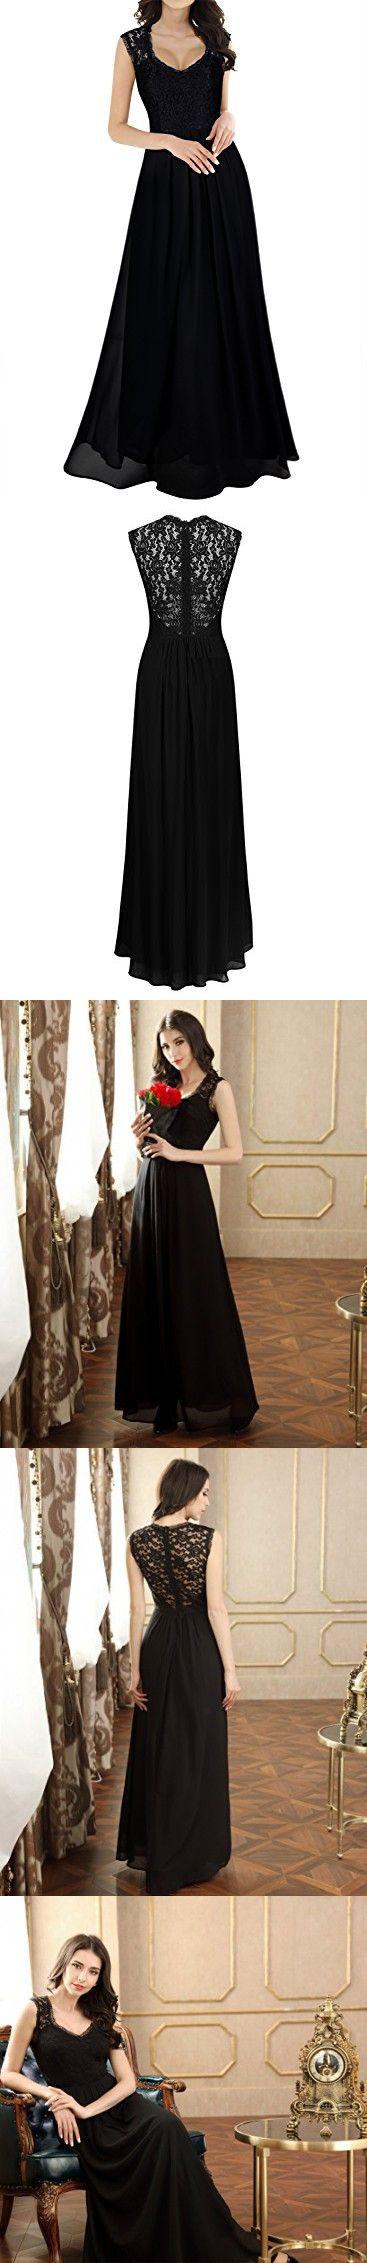 cbe2b26c3681 Miusol Women's Casual Deep- V Neck Sleeveless Vintage Wedding Maxi Dress